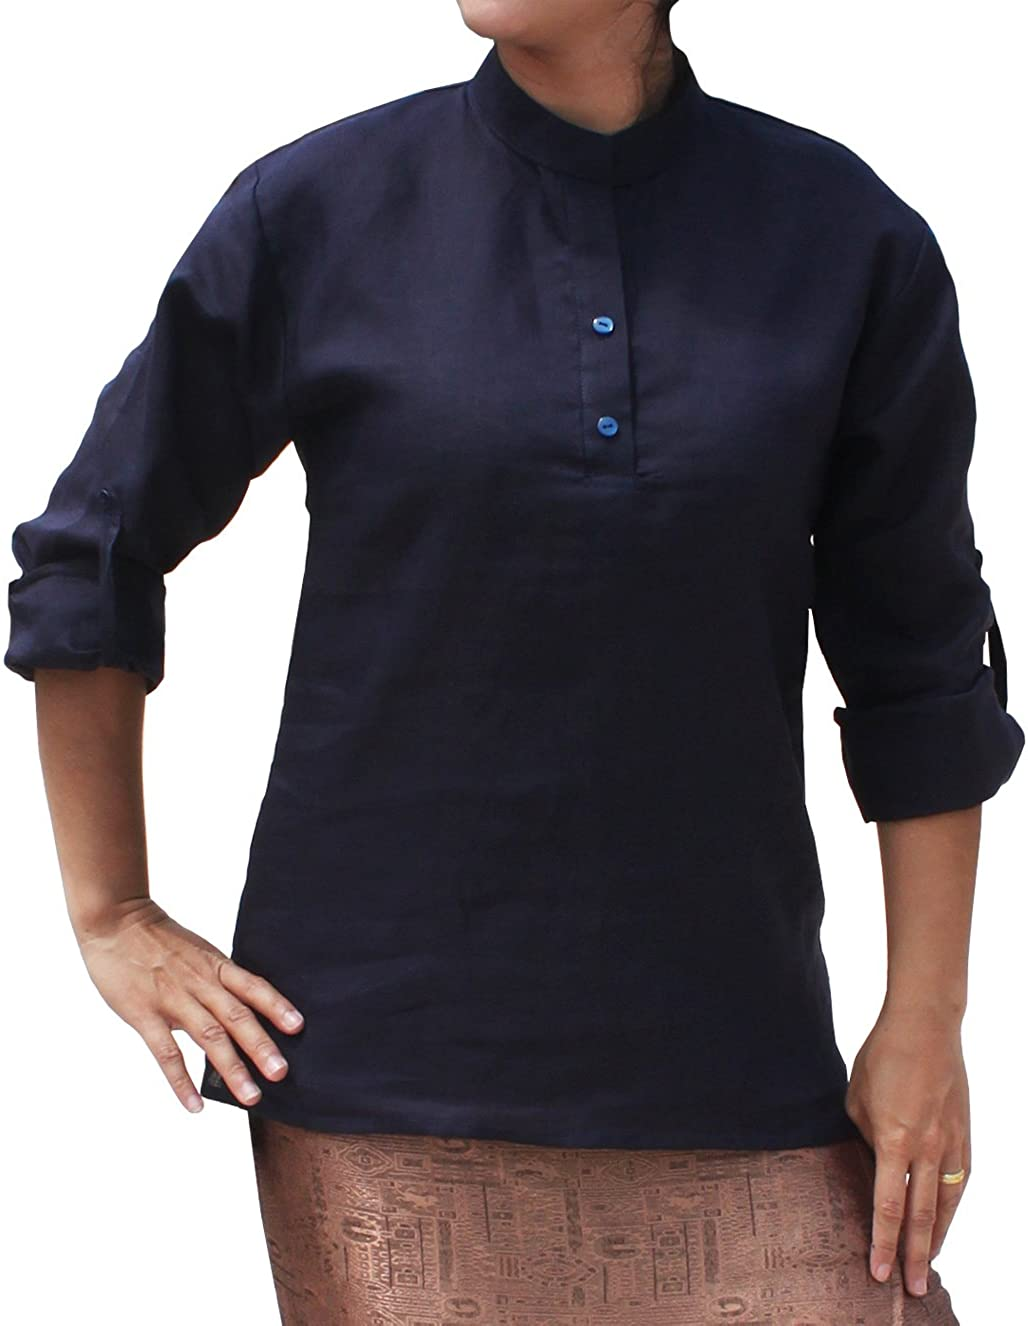 RaanPahMuang Thin Ramy Linen Shirt Professional Collar Button Roll up Sleeve